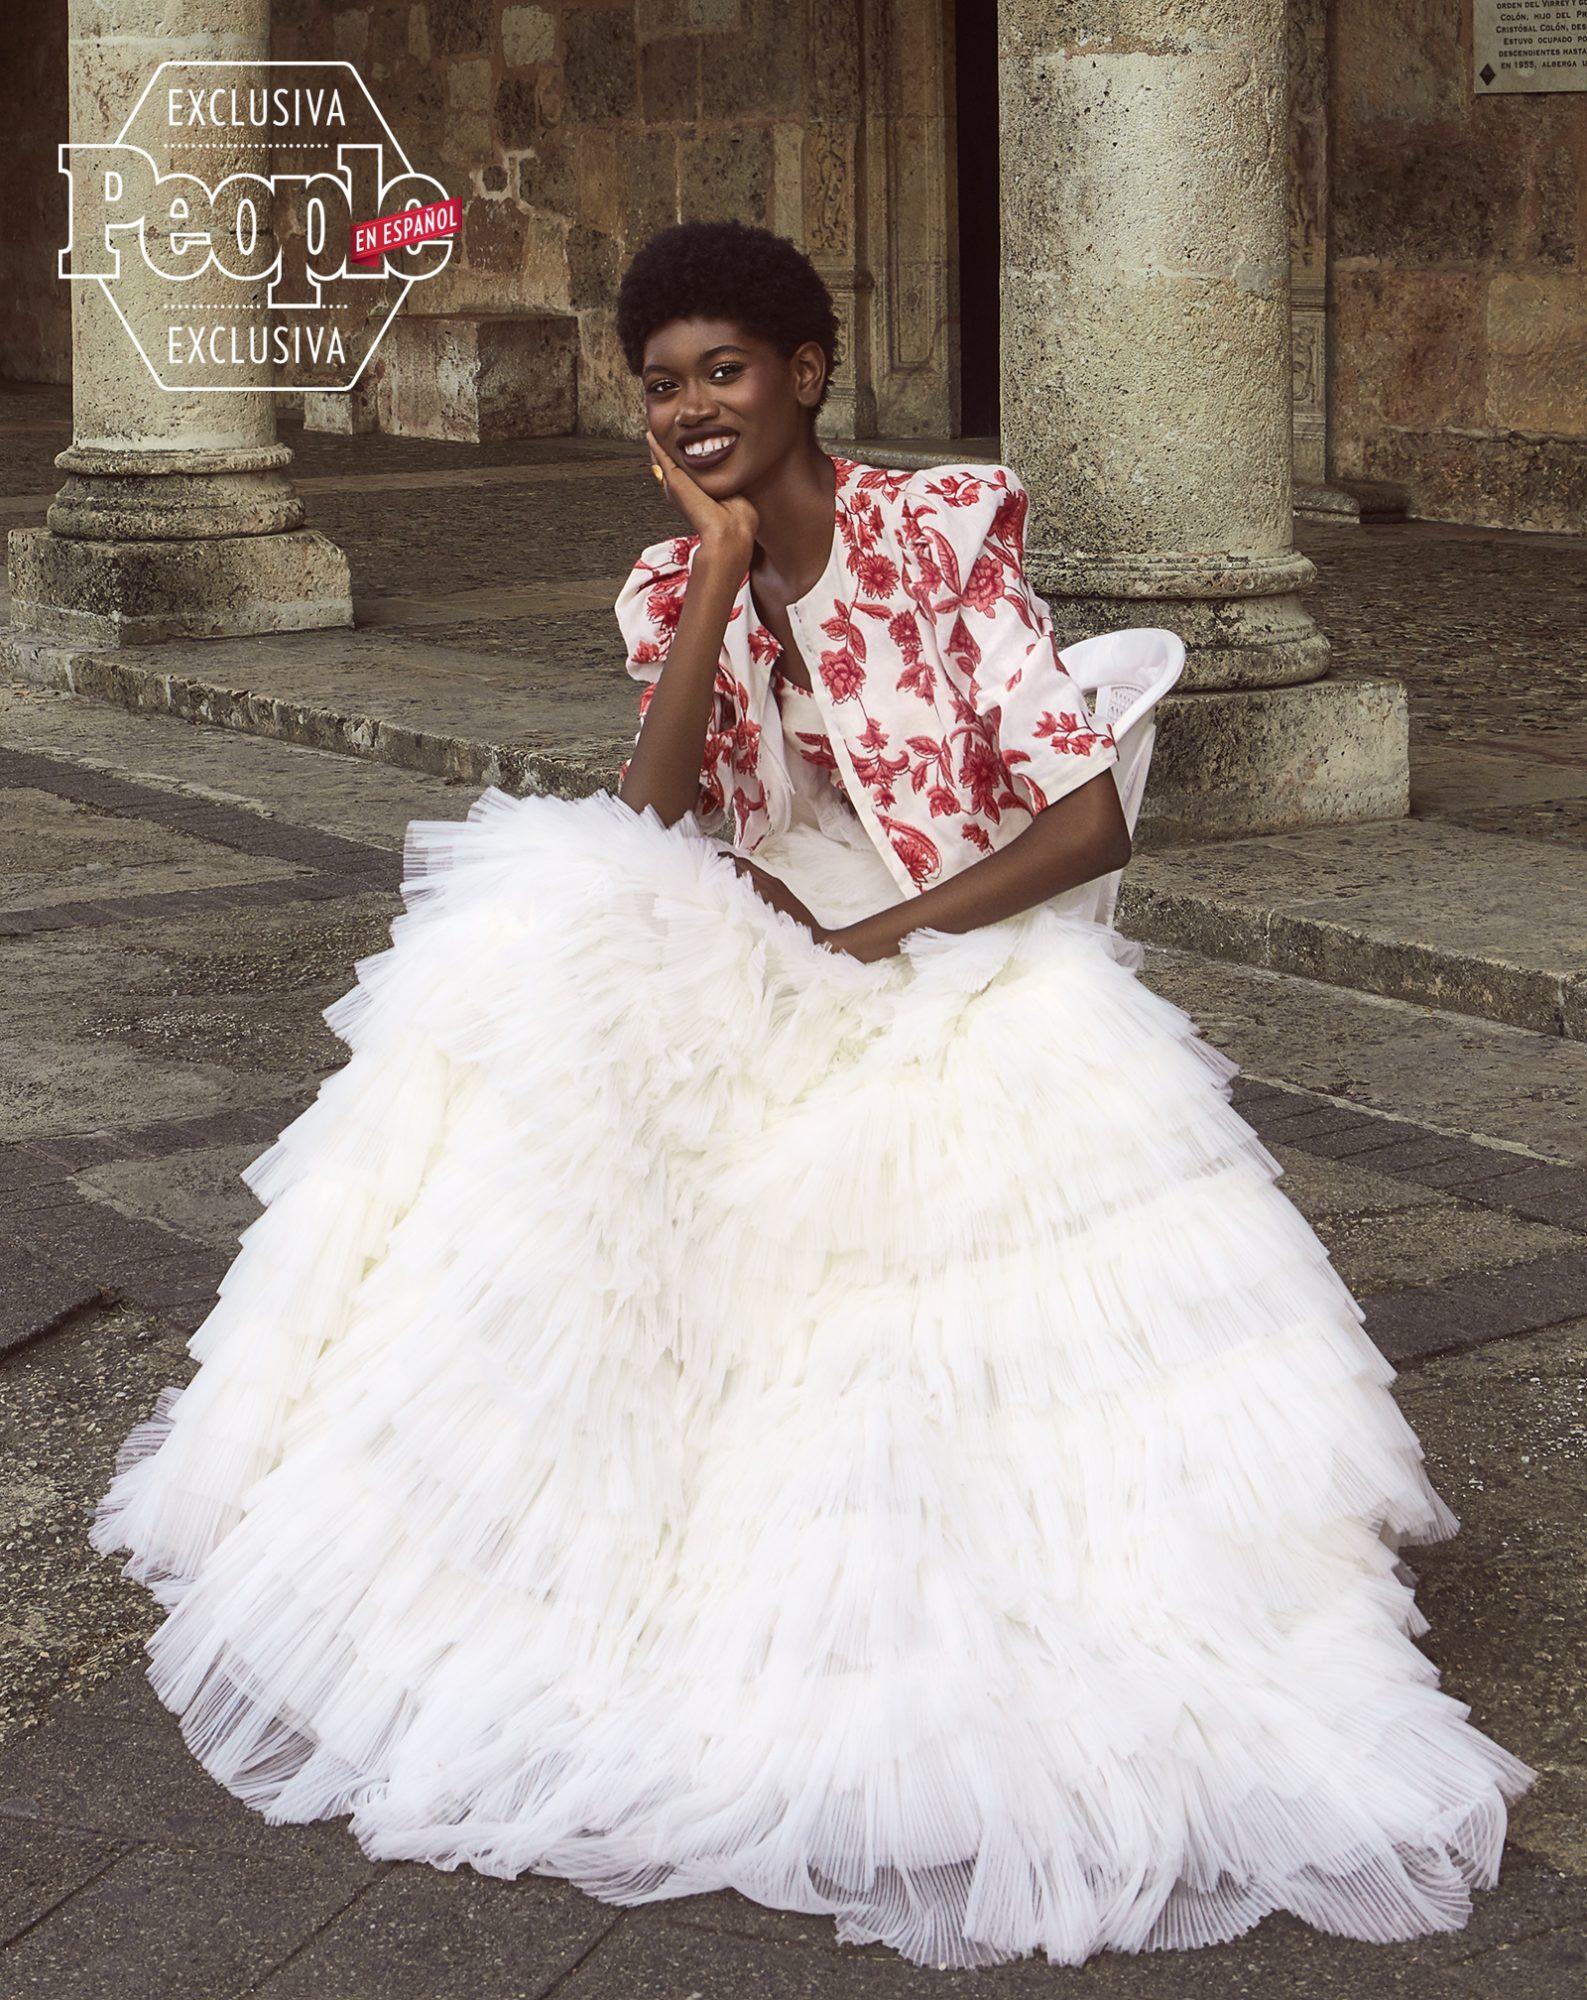 Jenniffer Concepcion - Dominican Models